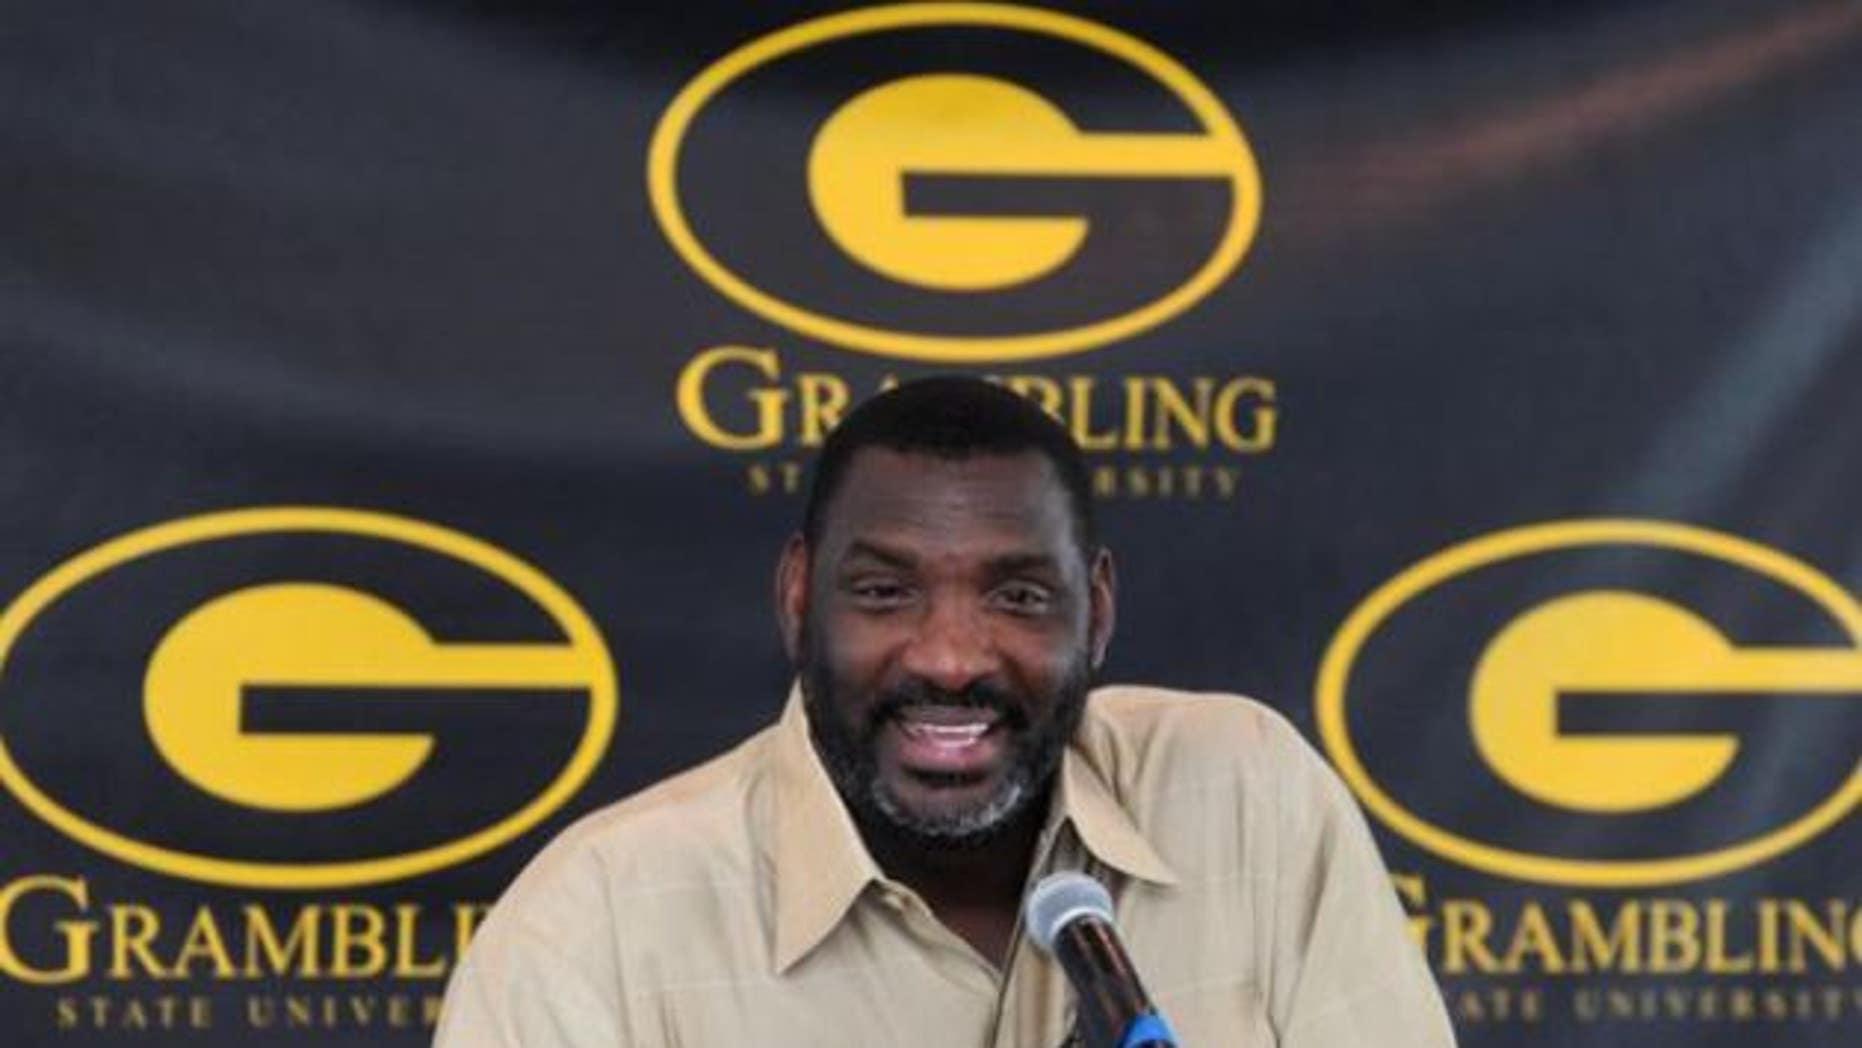 Doug Williams, former Grambling football coach, who was fired earlier this season. (AP Photo)